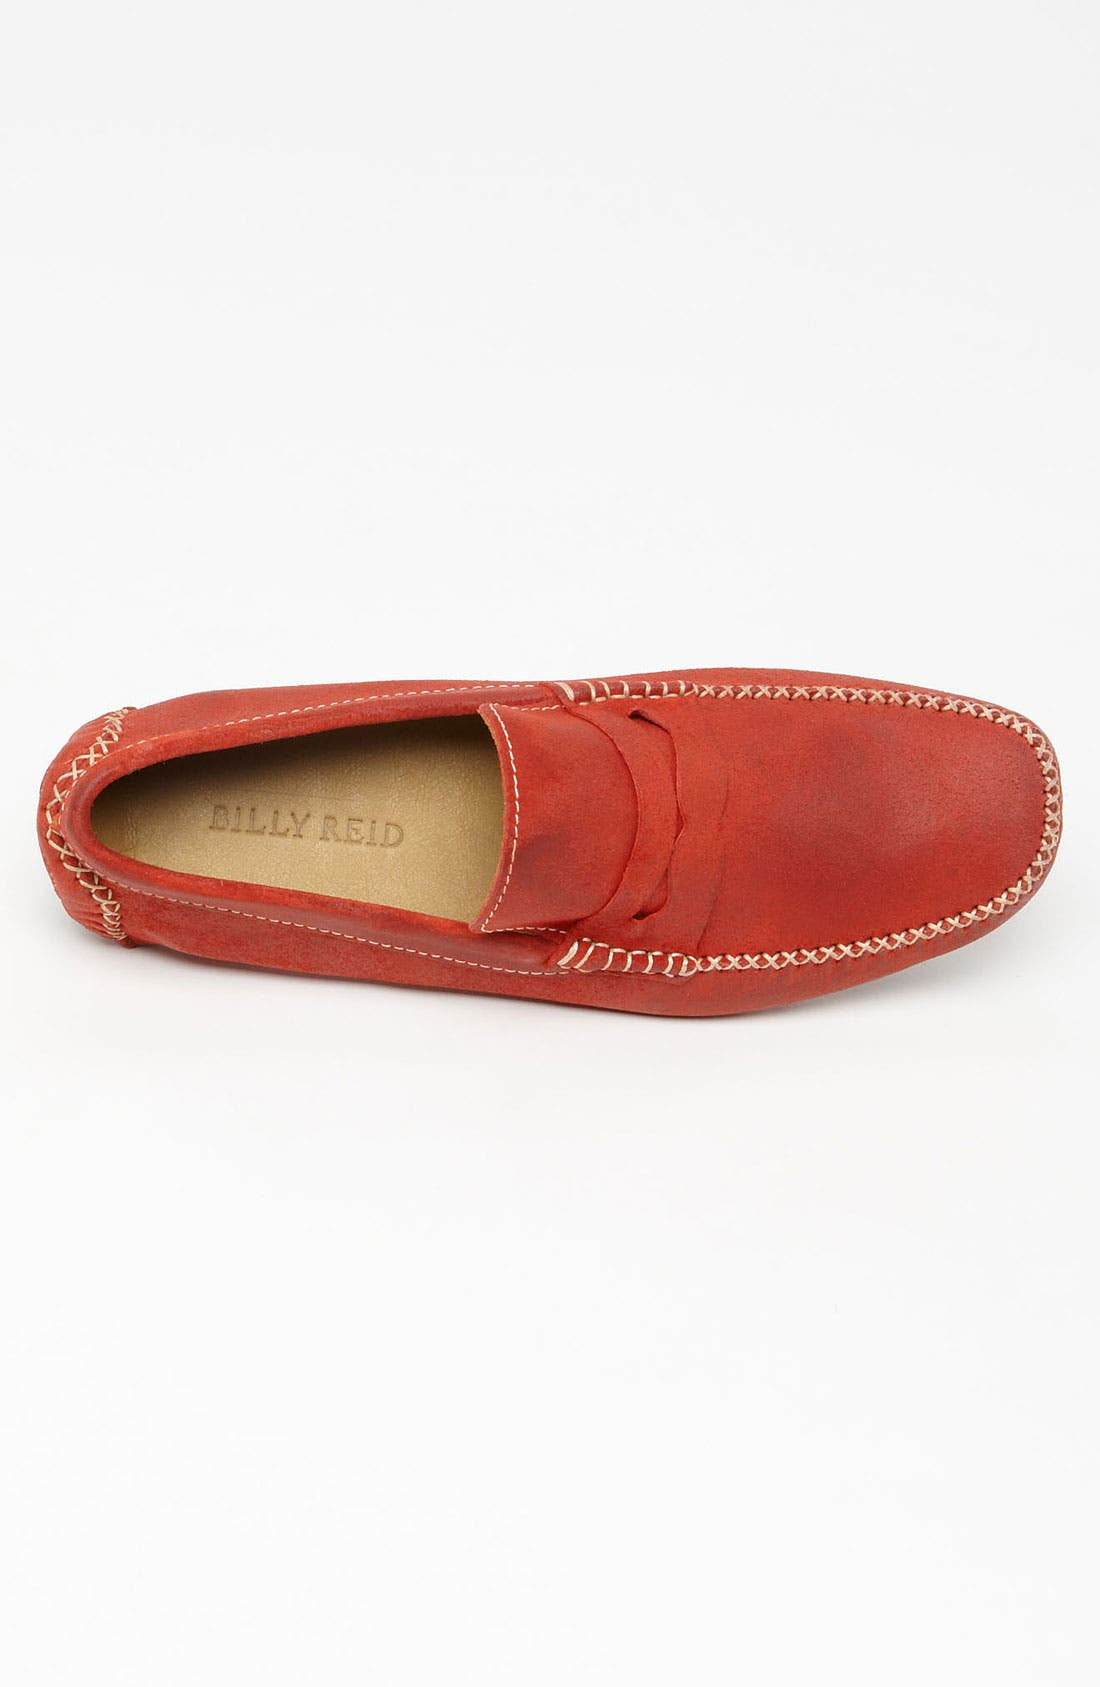 Alternate Image 3  - Billy Reid Driving Shoe